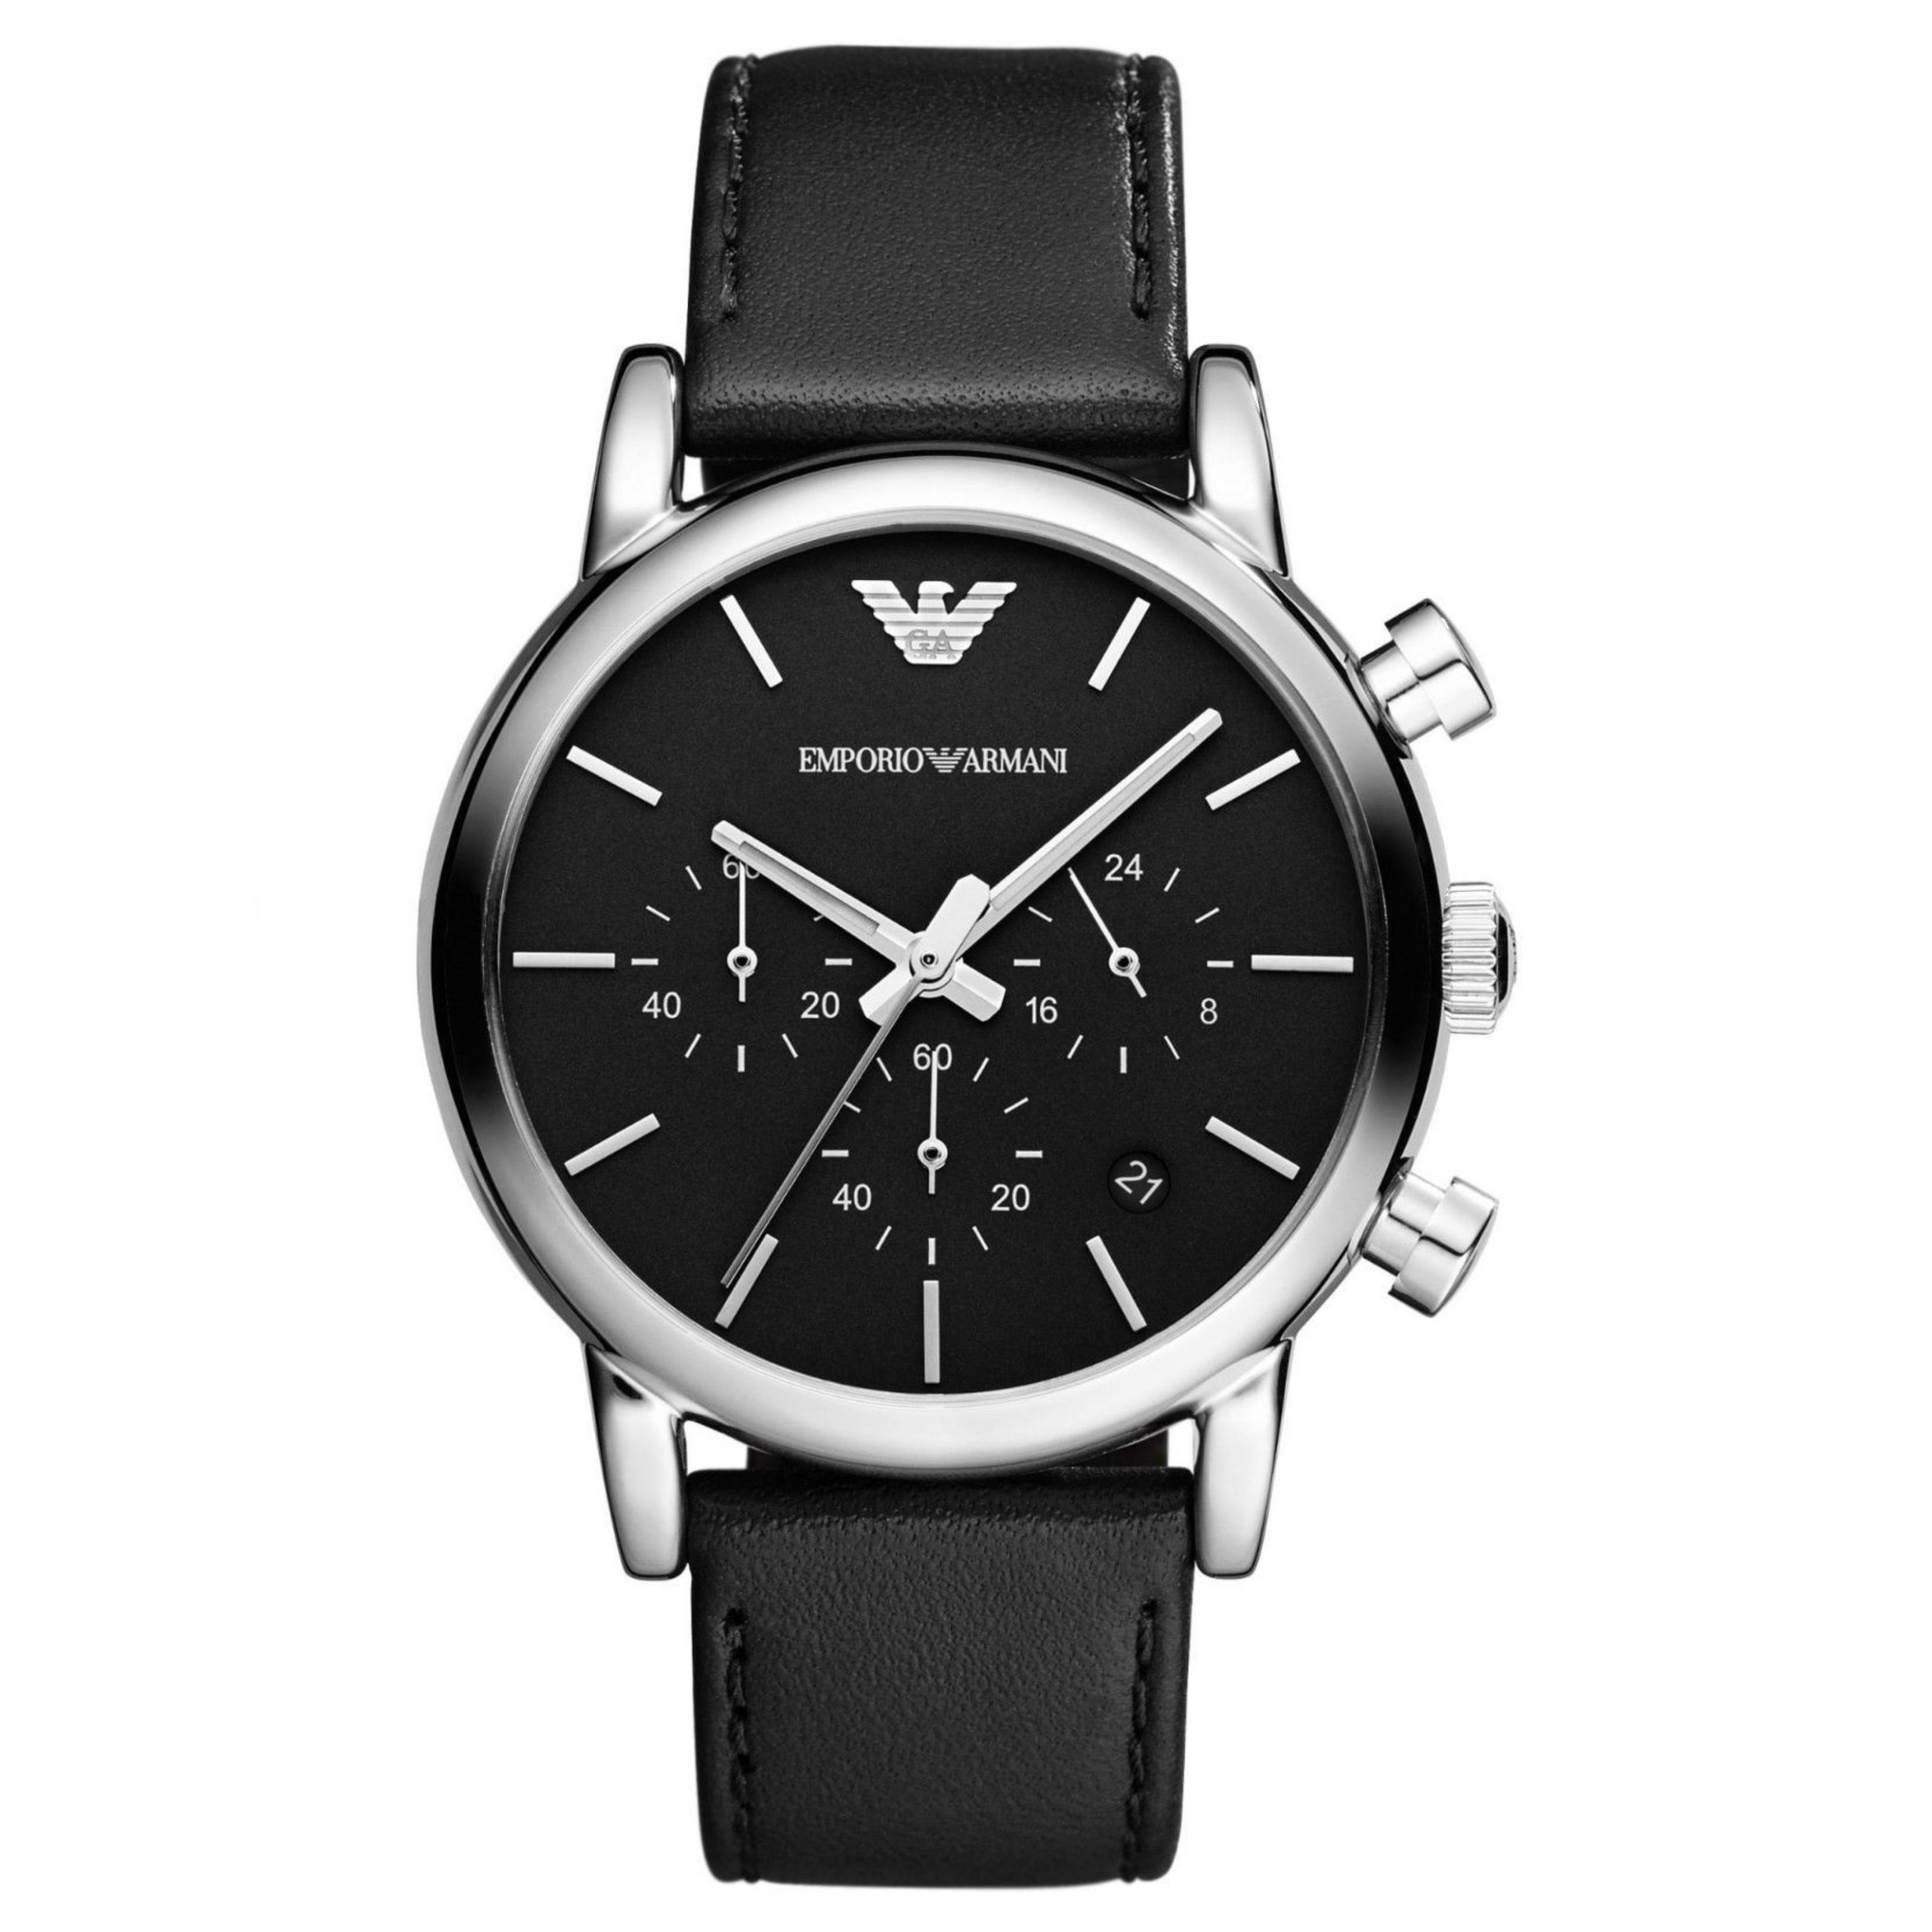 Emporio Armani Classic Chronograph Black Dial Leather Strap Men's Watch AR1733